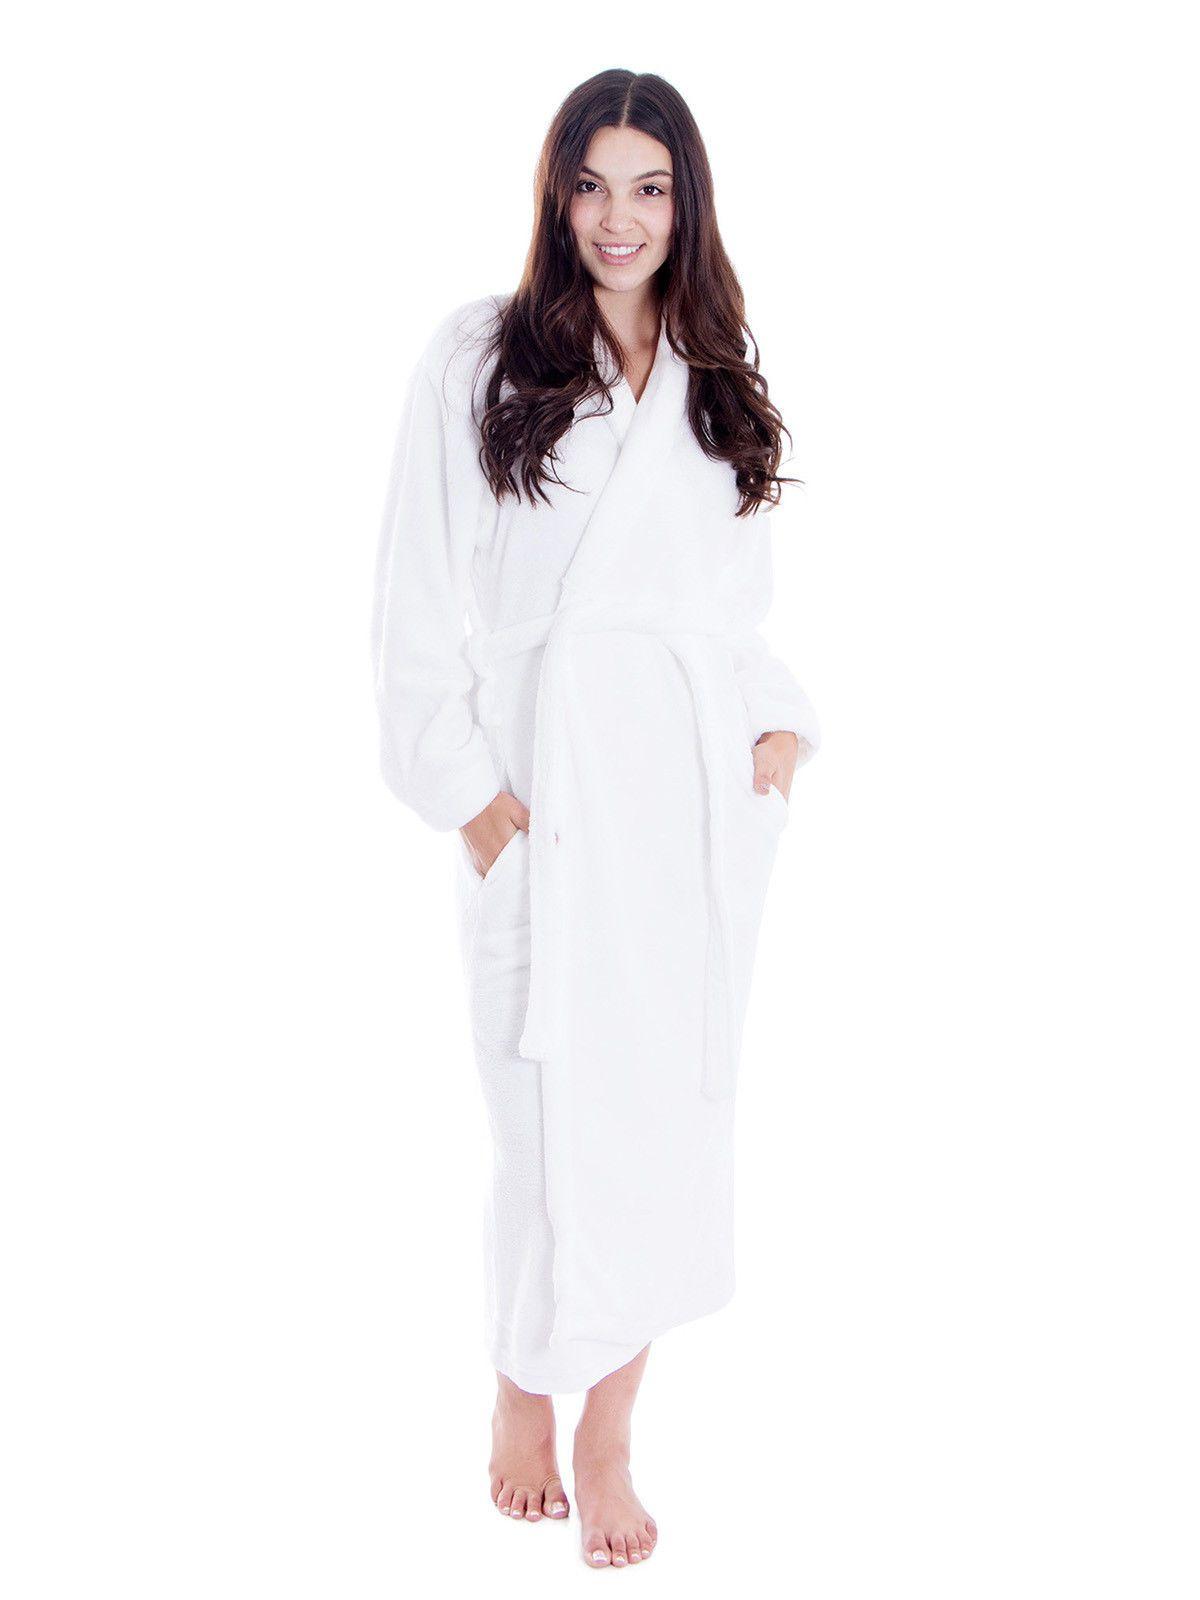 Women Men Long Sleepwear Robes Warm Winter Collar Shawl Bathrobe Spa Robes   Bathrobe  Collar 852fe83f1